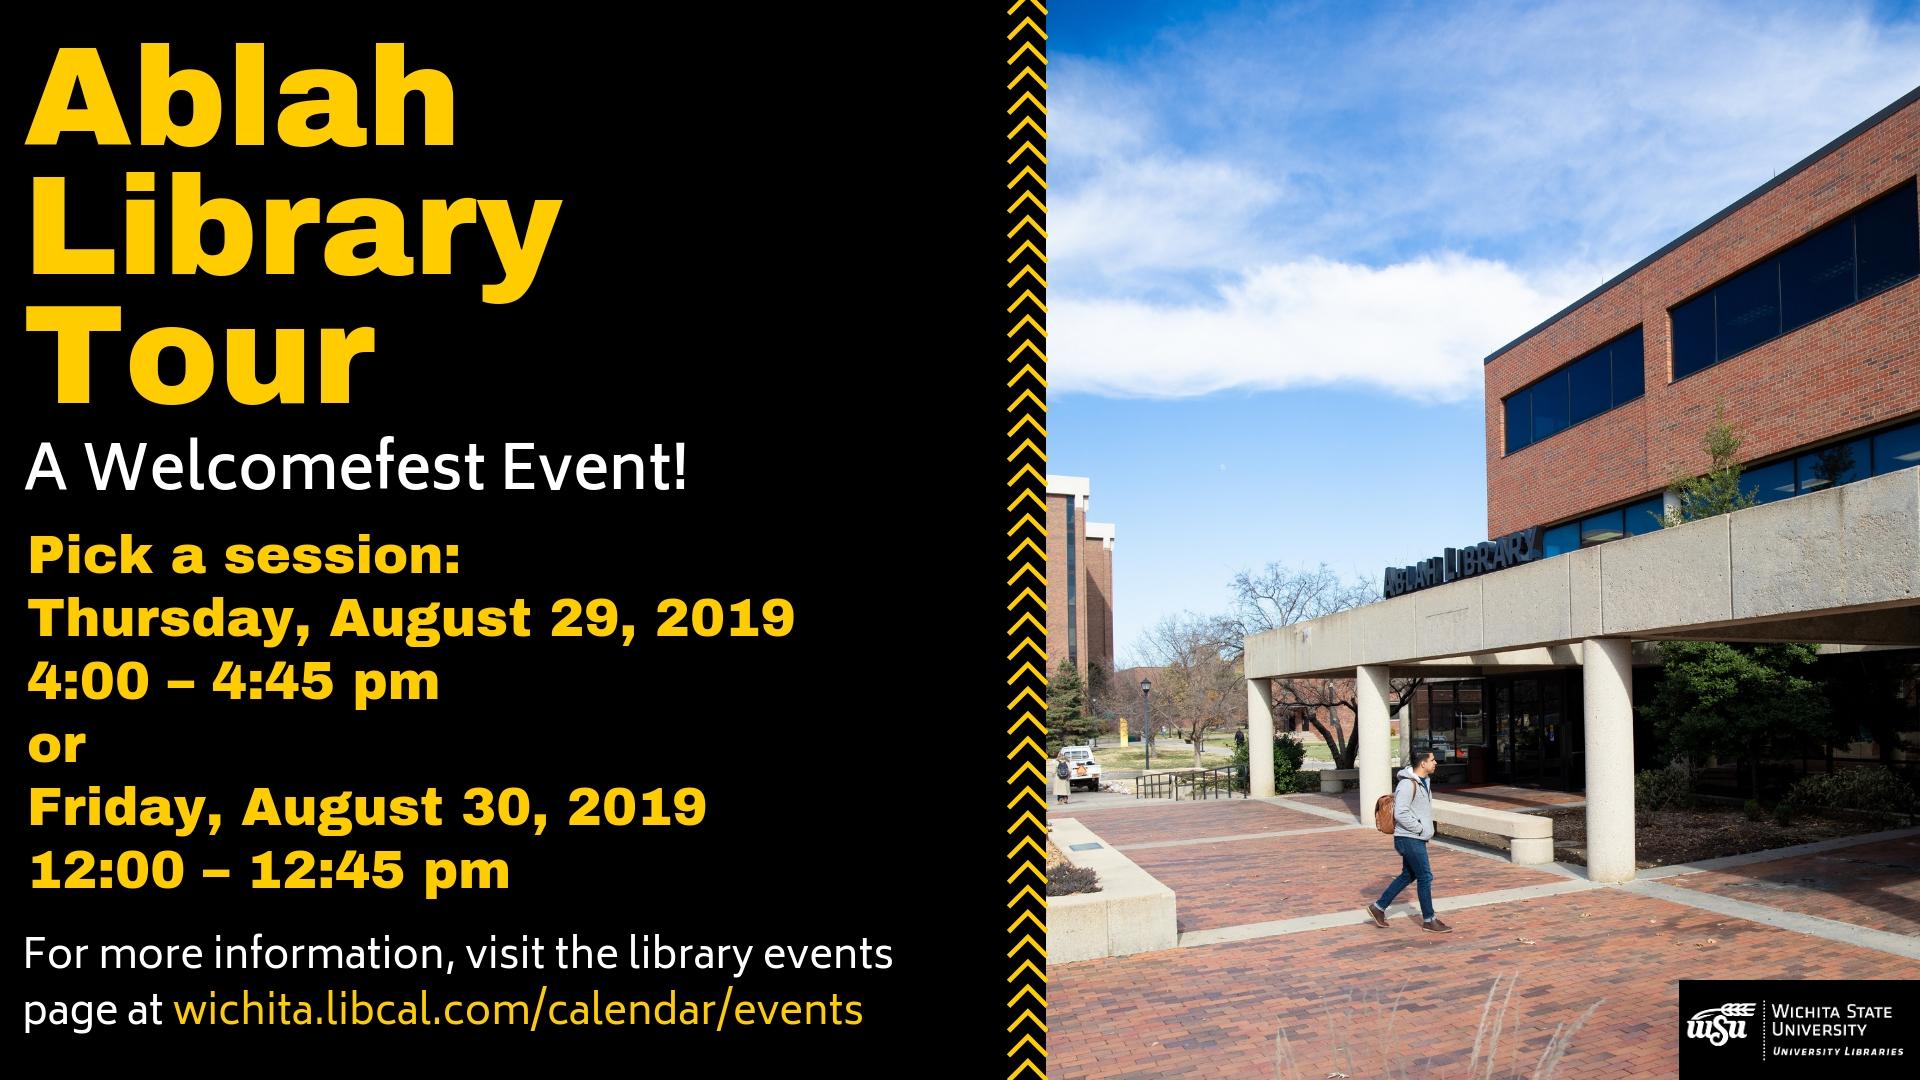 Ablah Library Tour